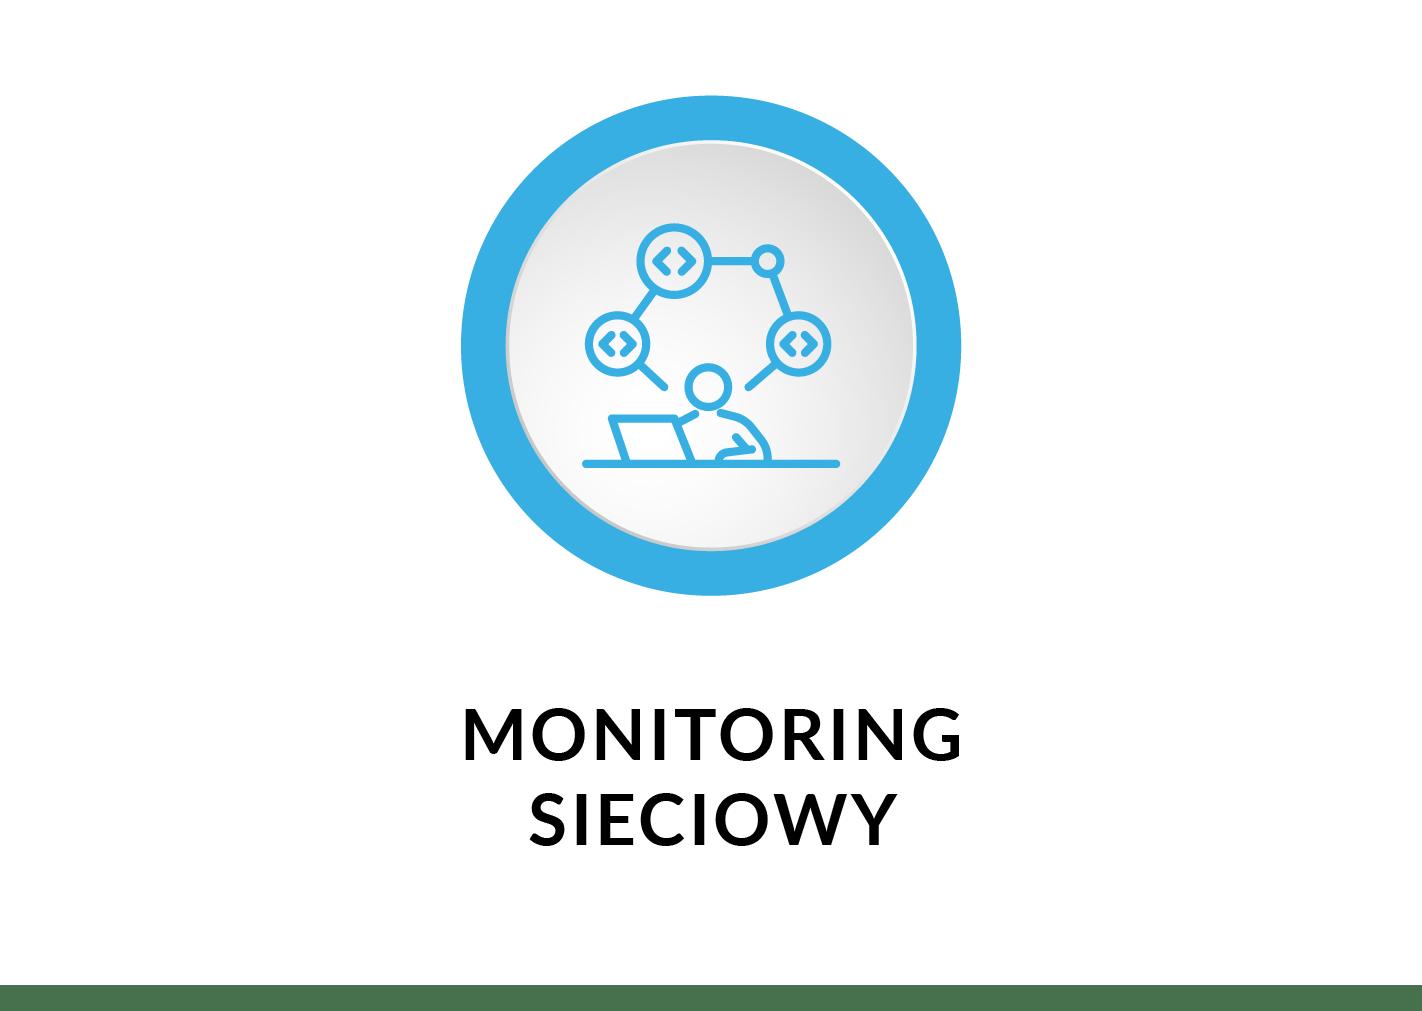 monitoring-sieciowy (1)